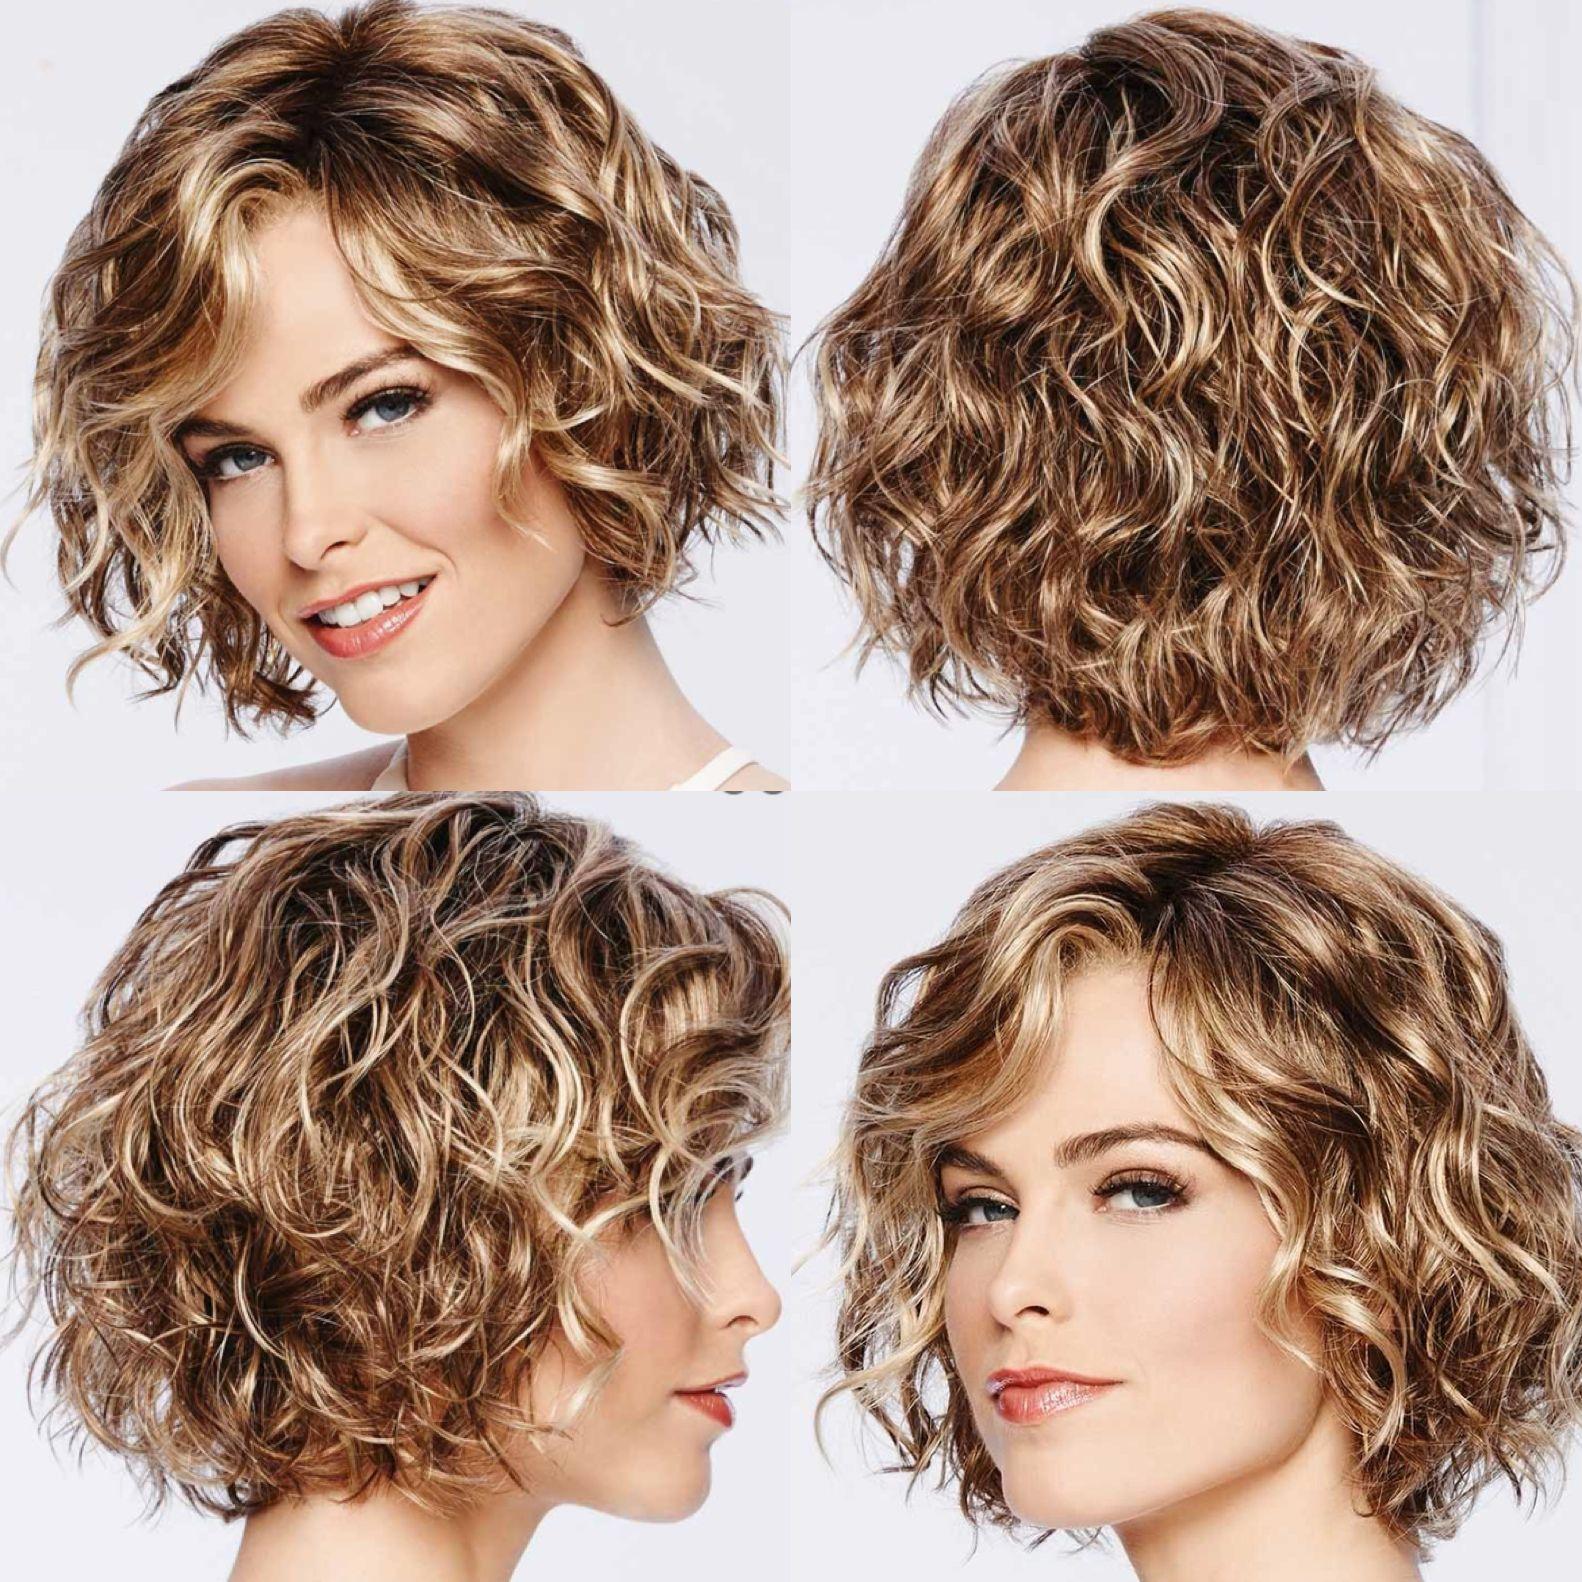 Perms Style Avedaibw Short Permed Hair Curly Hair Styles Medium Hair Styles